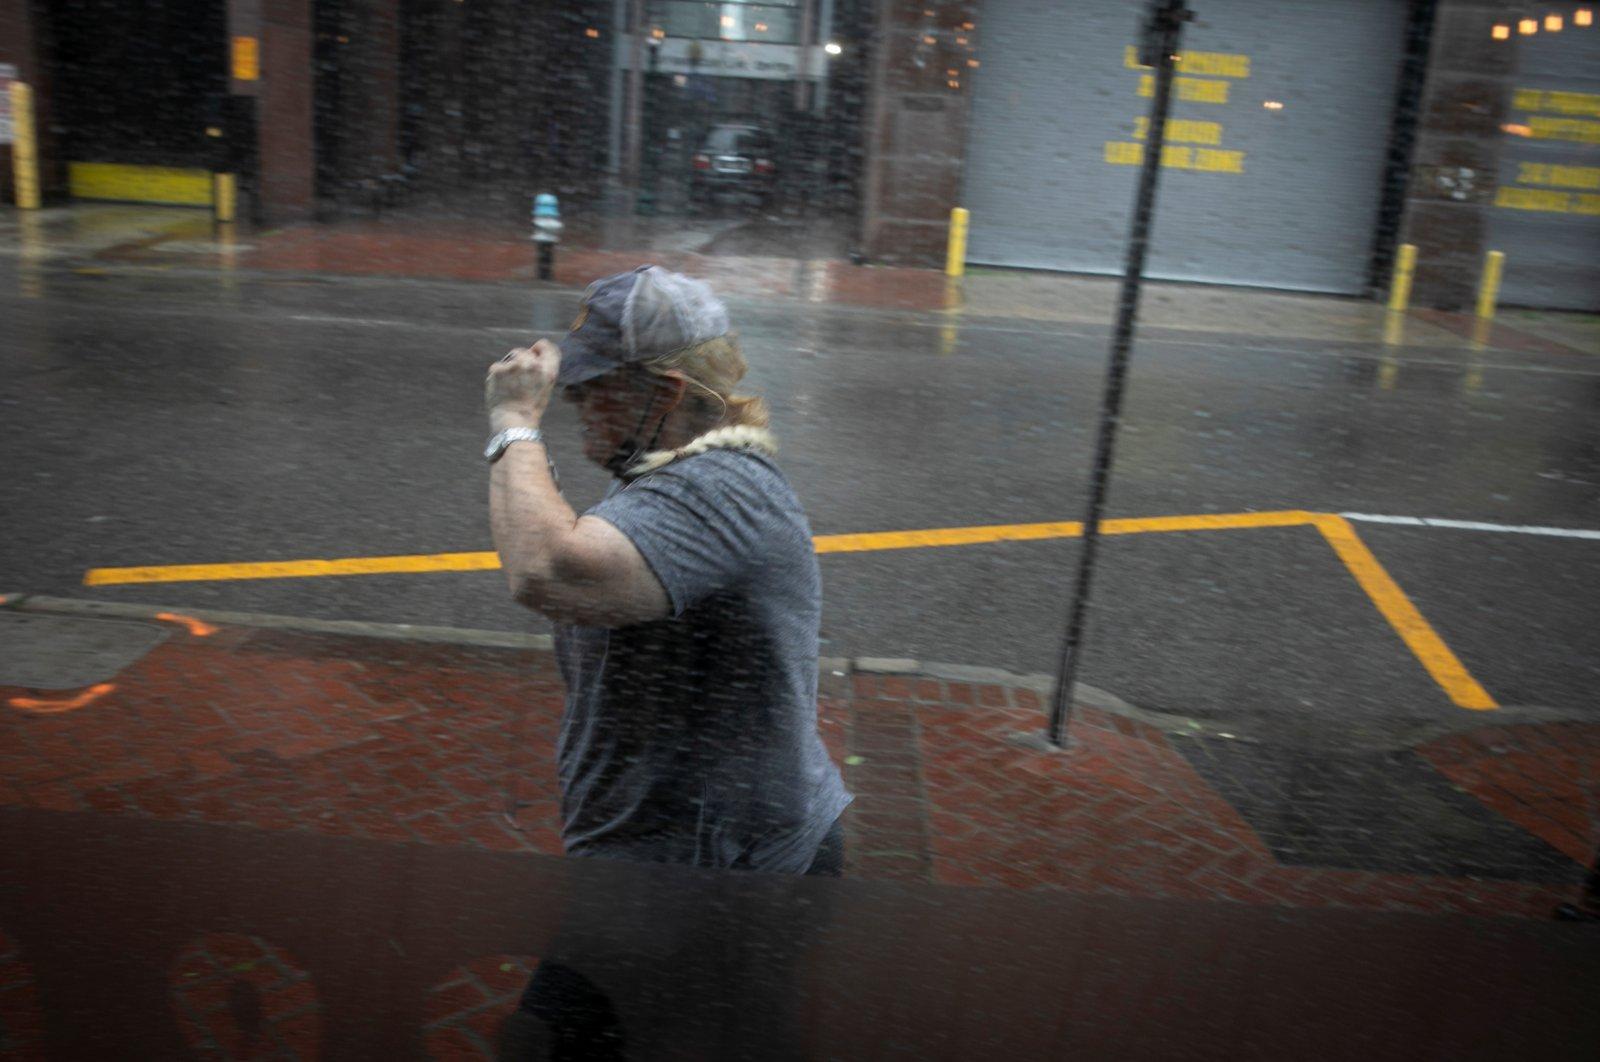 A woman walks in the rain as Hurricane Ida makes landfall in Louisiana, in New Orleans, Louisiana, U.S. Aug. 29, 2021. (REUTERS)